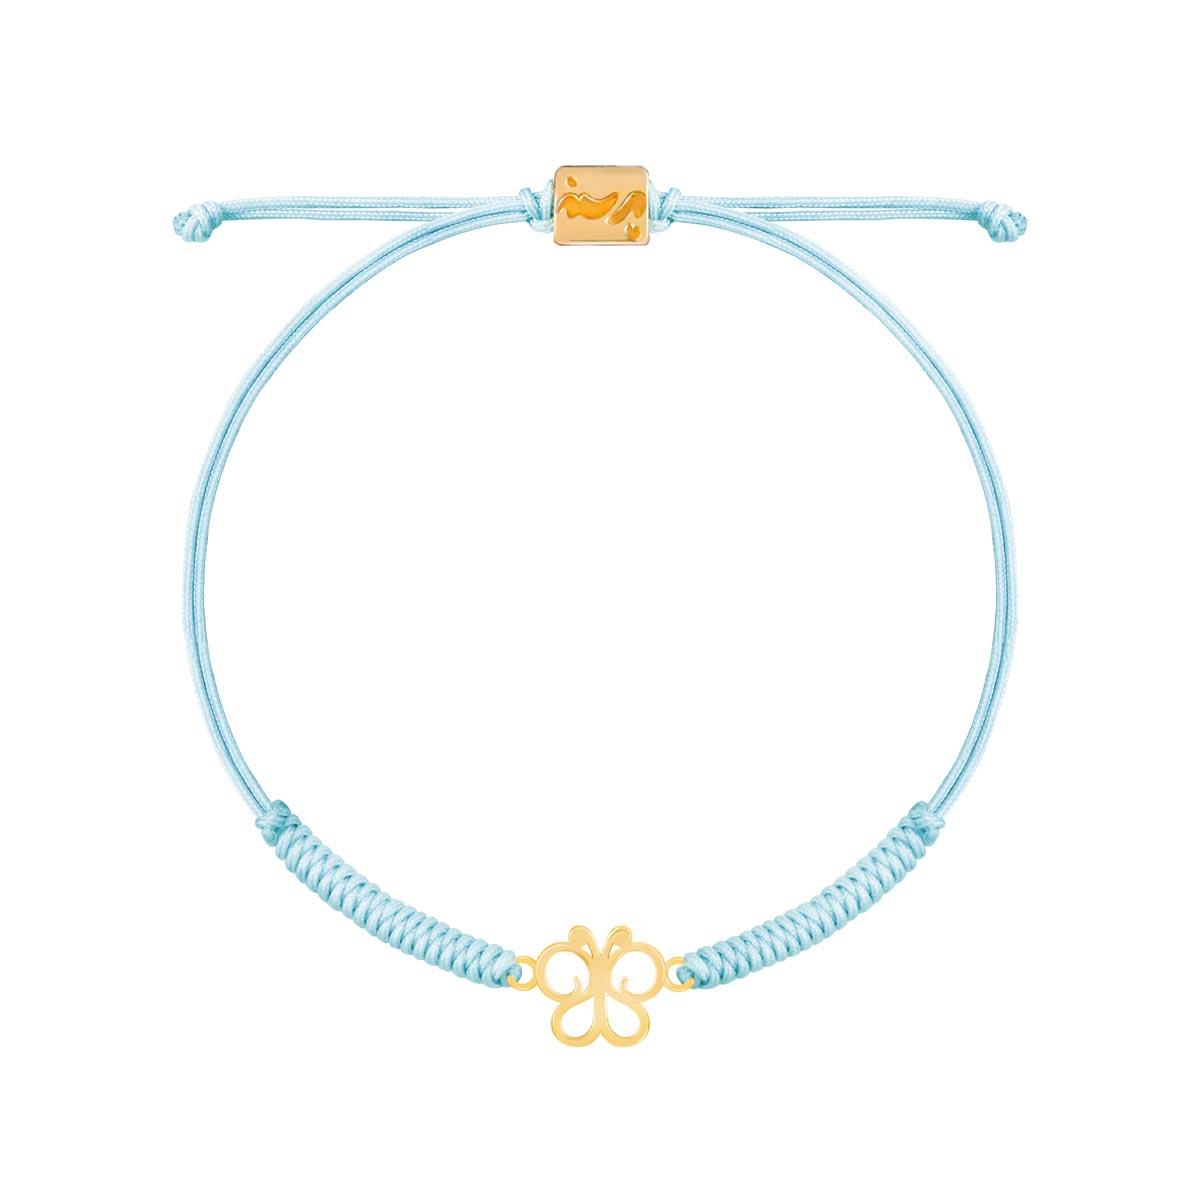 دستبند طلا دخترانه پروانه پرسته